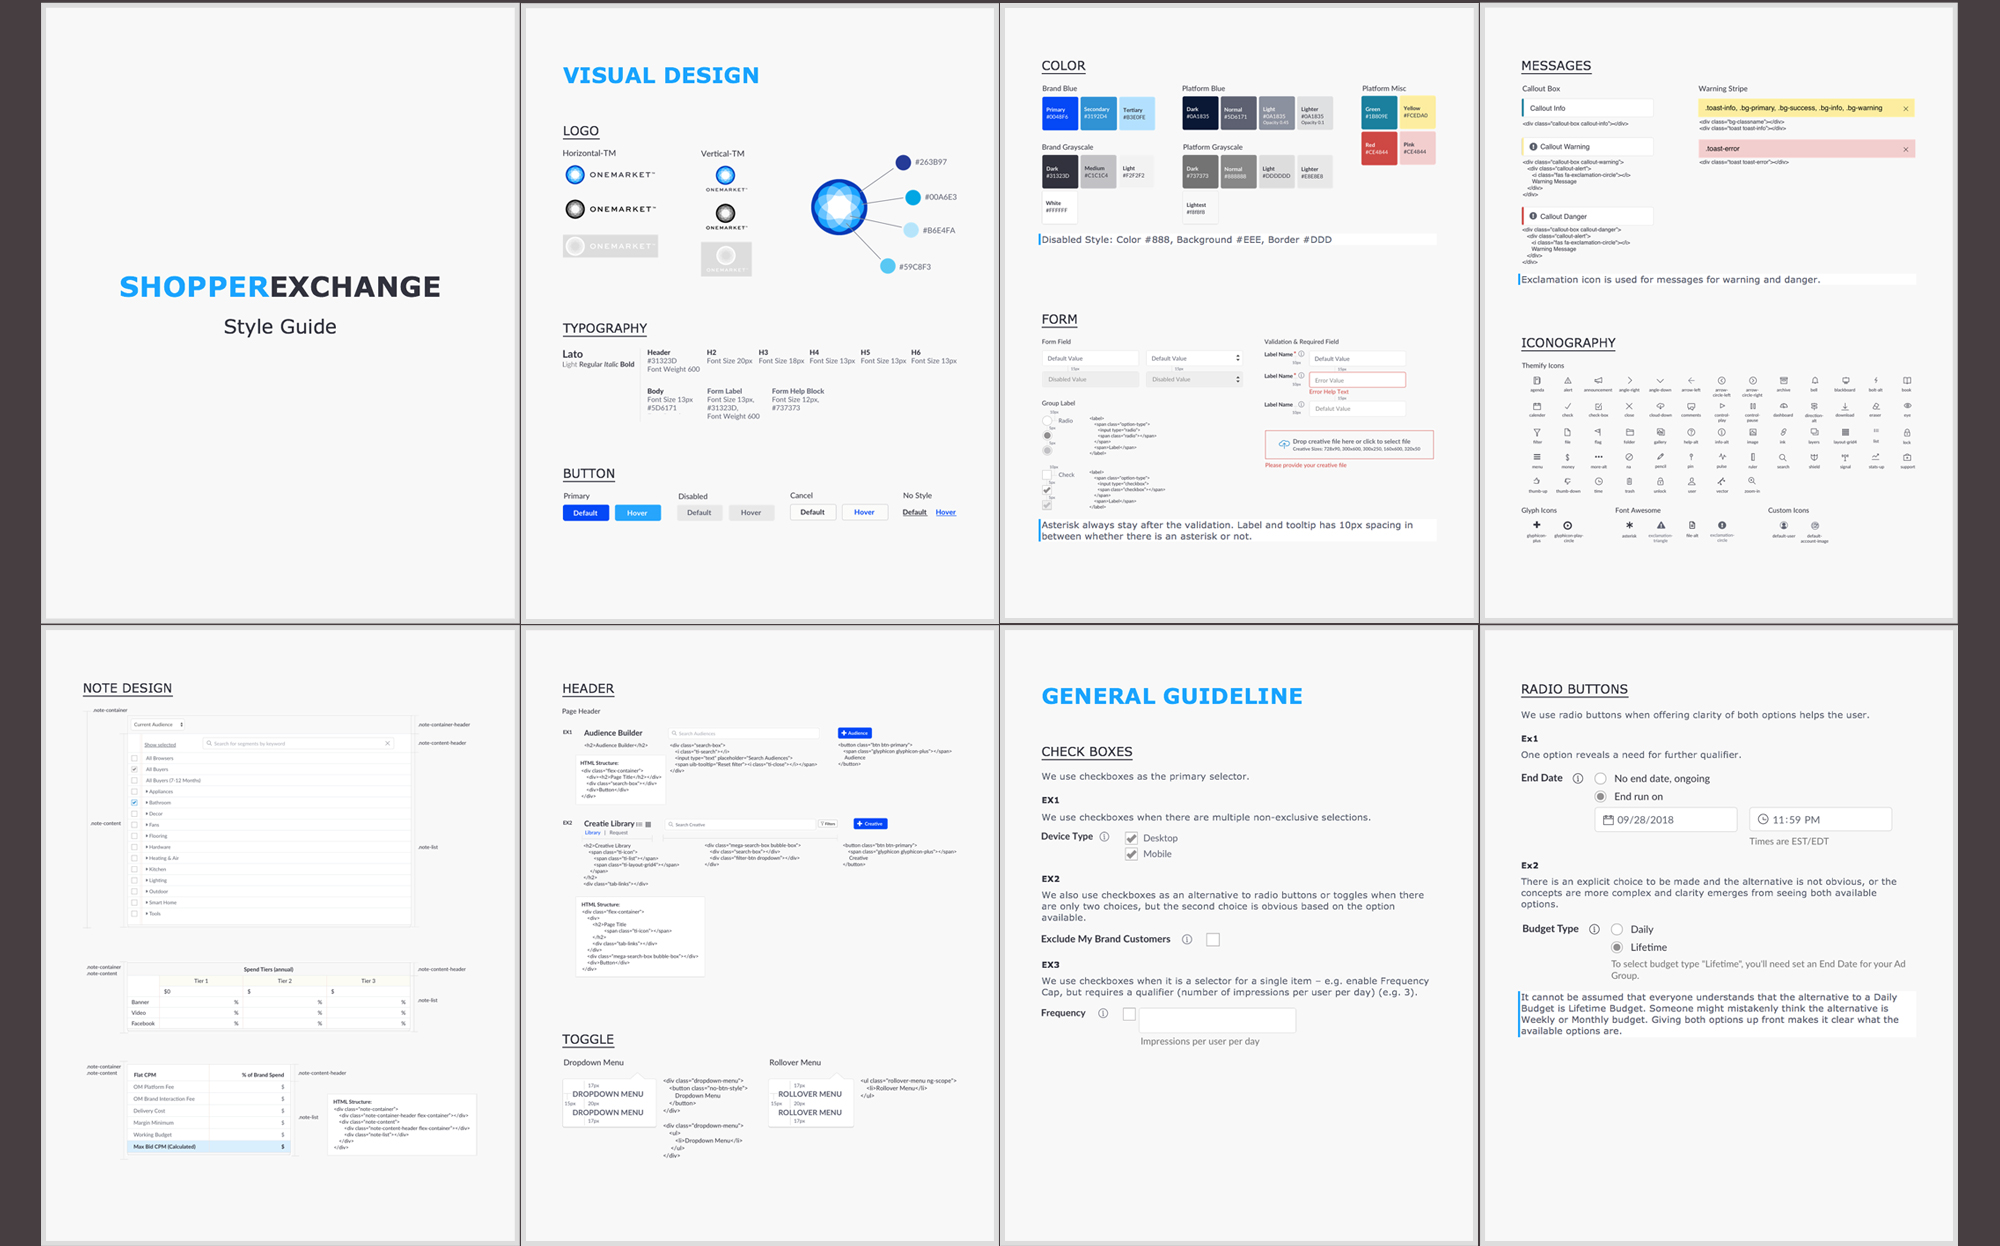 OneMarket Style Guide Design